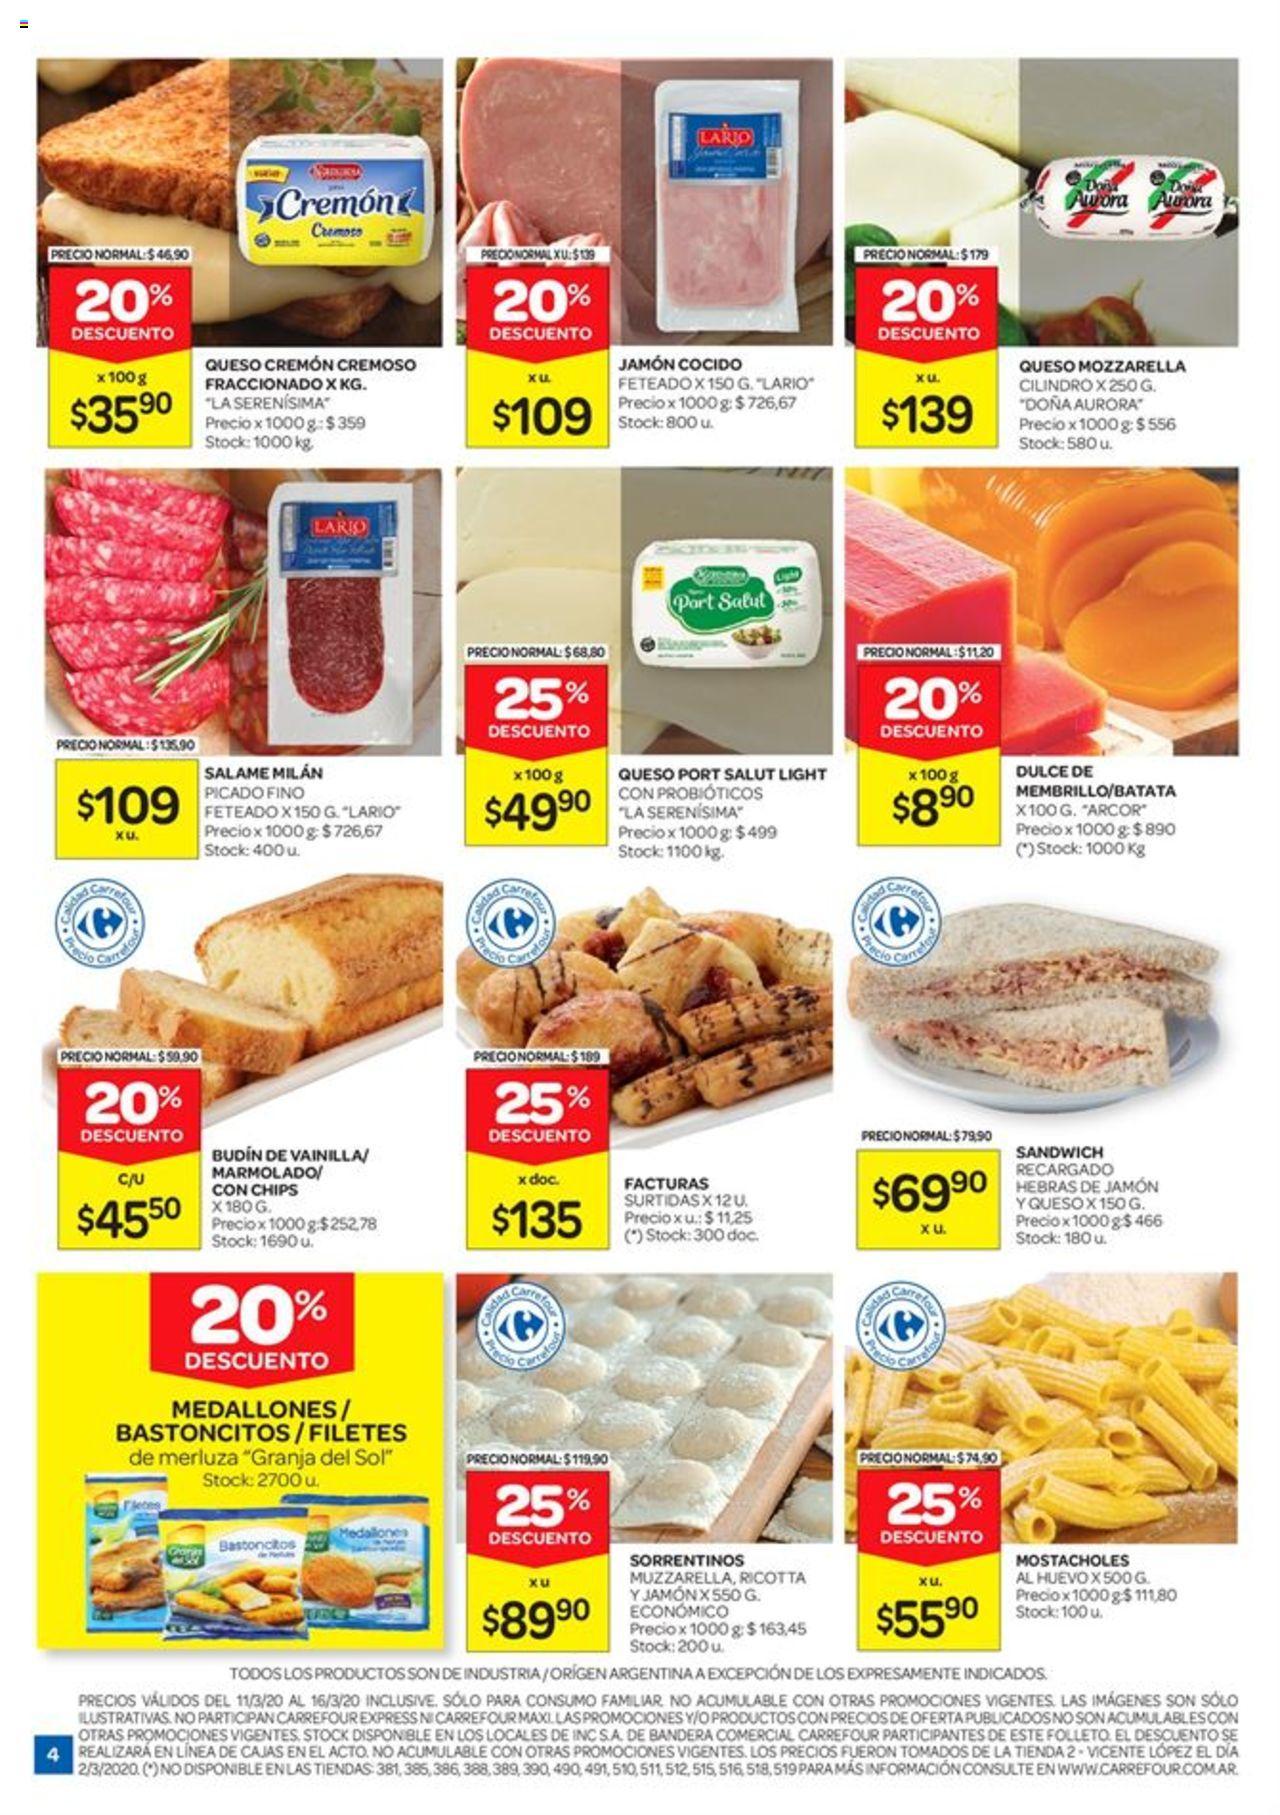 Carrefour - Catálogo válido desde el 11/03/2020 número de página 1 | Página: 4